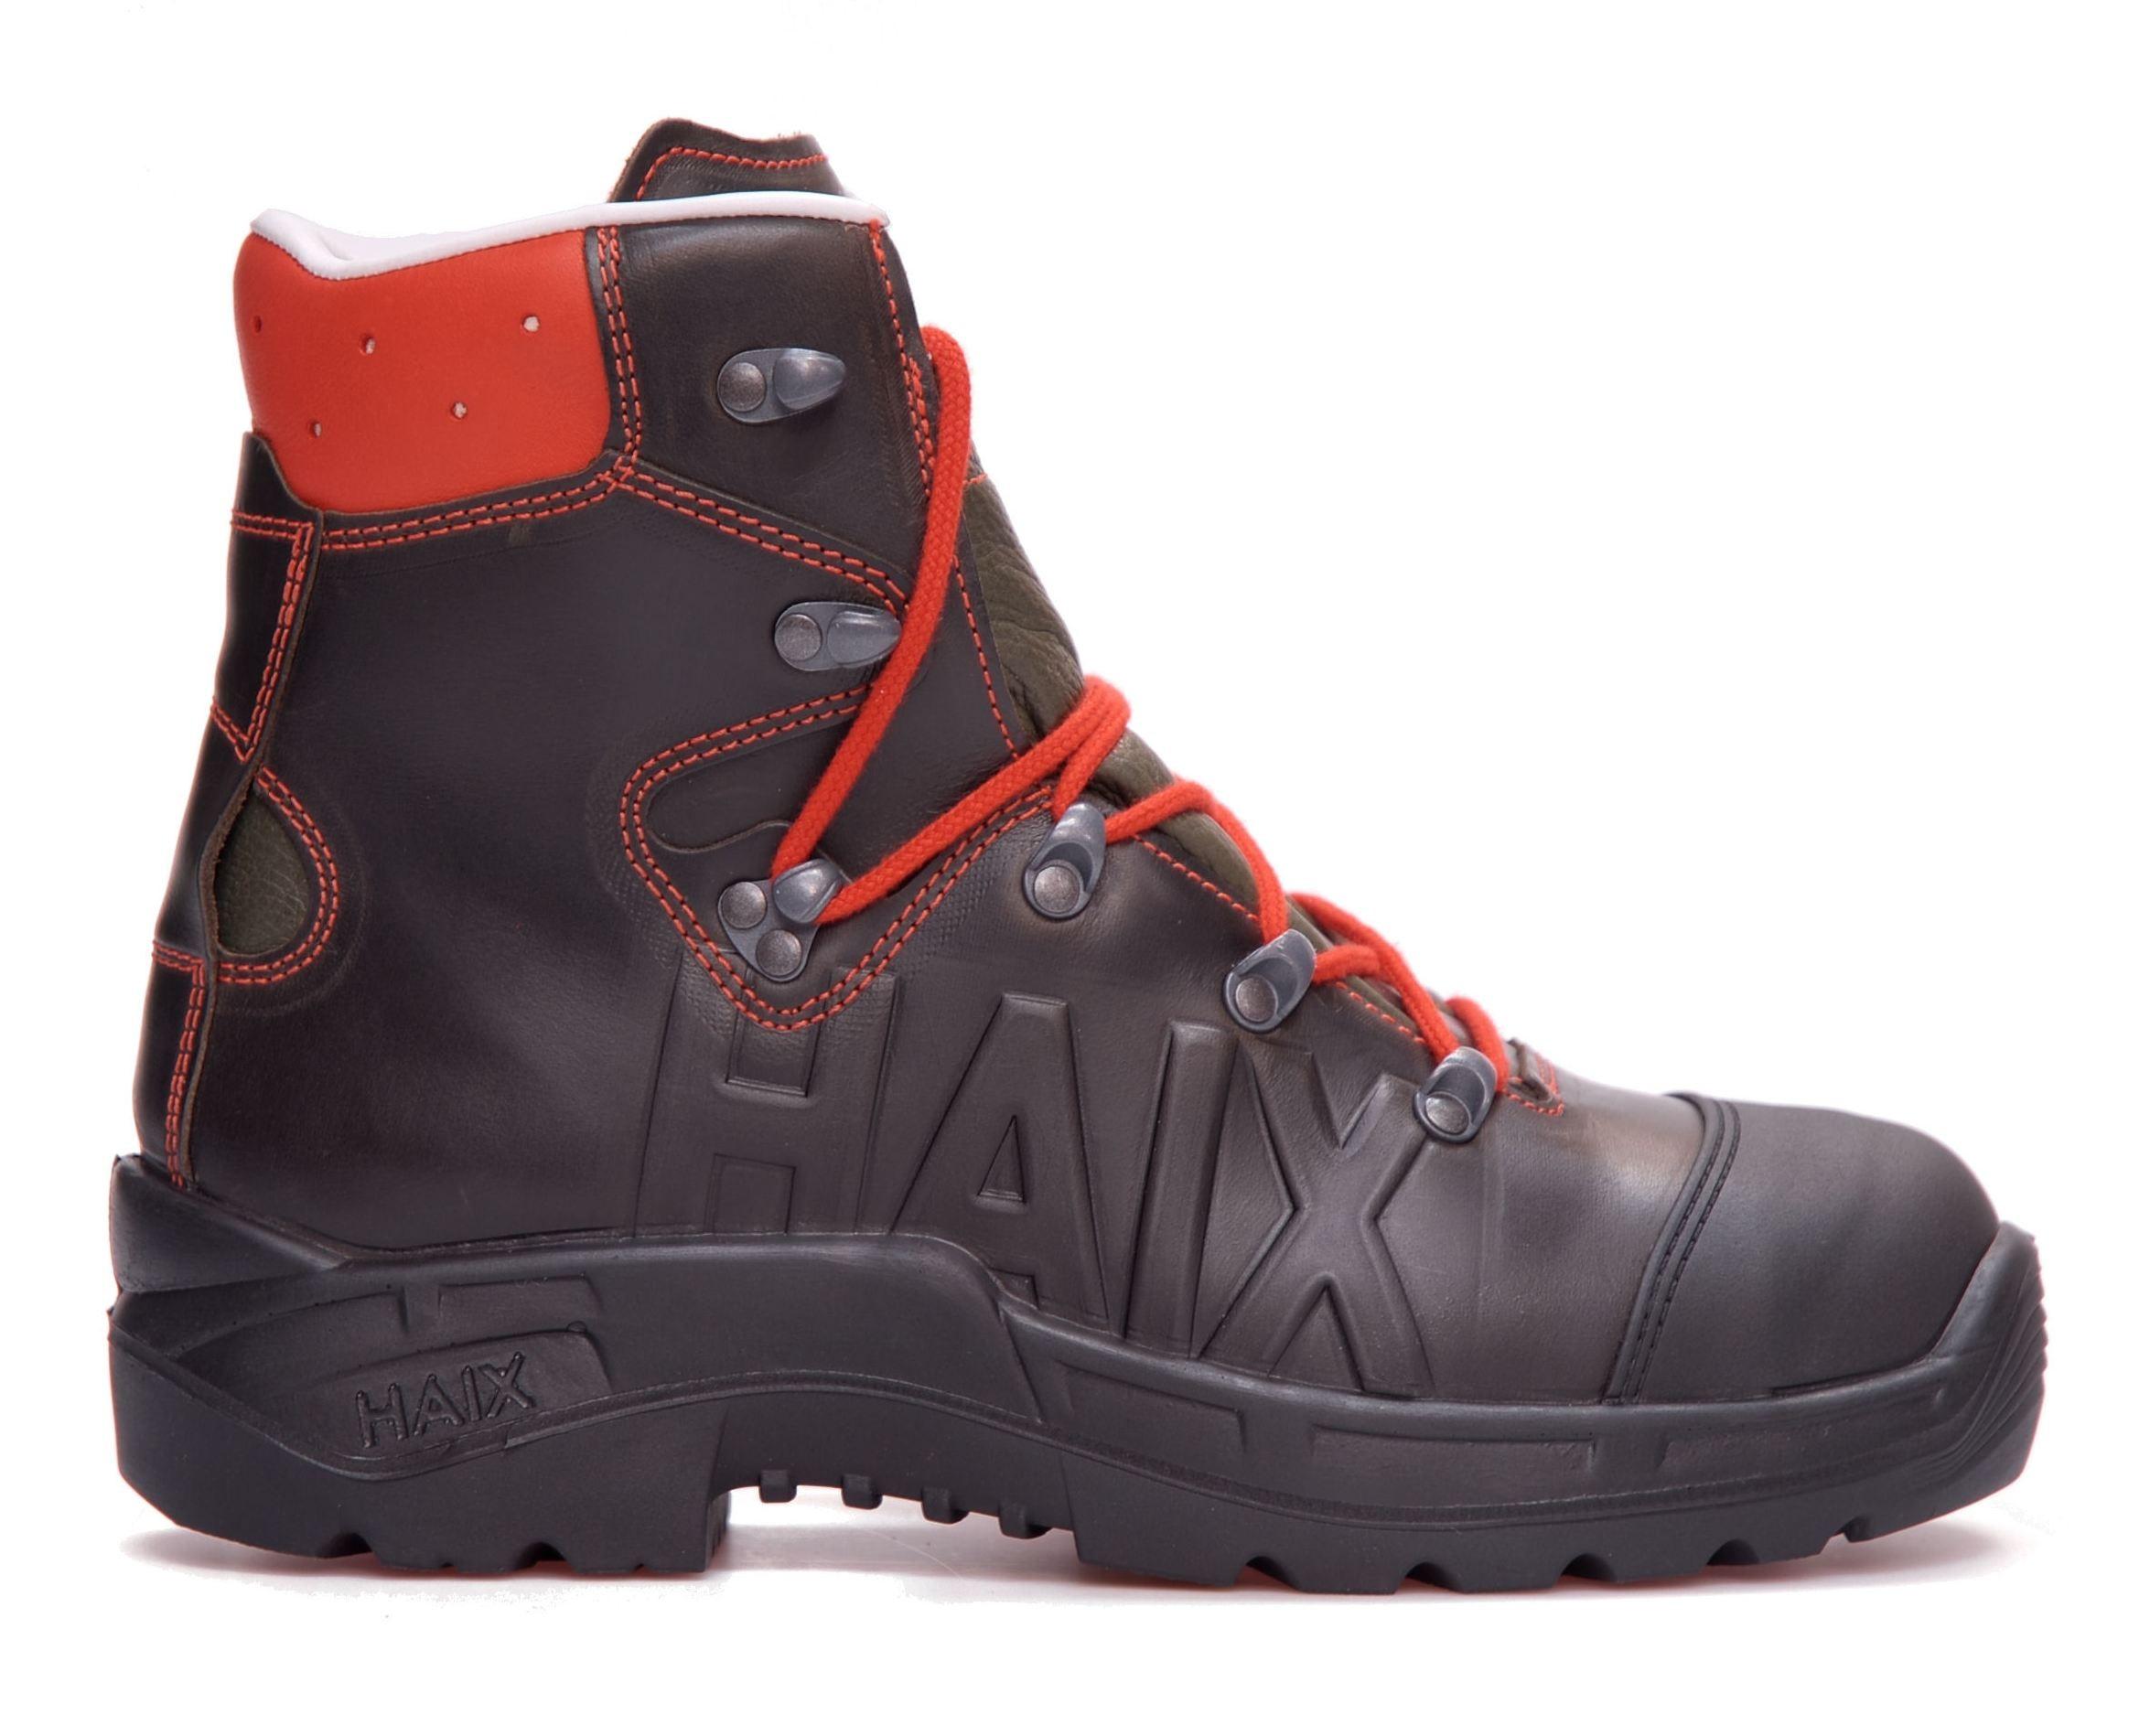 Anti Haix Chaussure Coupures Pfanner Gtx Bucheron chaussures Zermatt 34A5RjLq